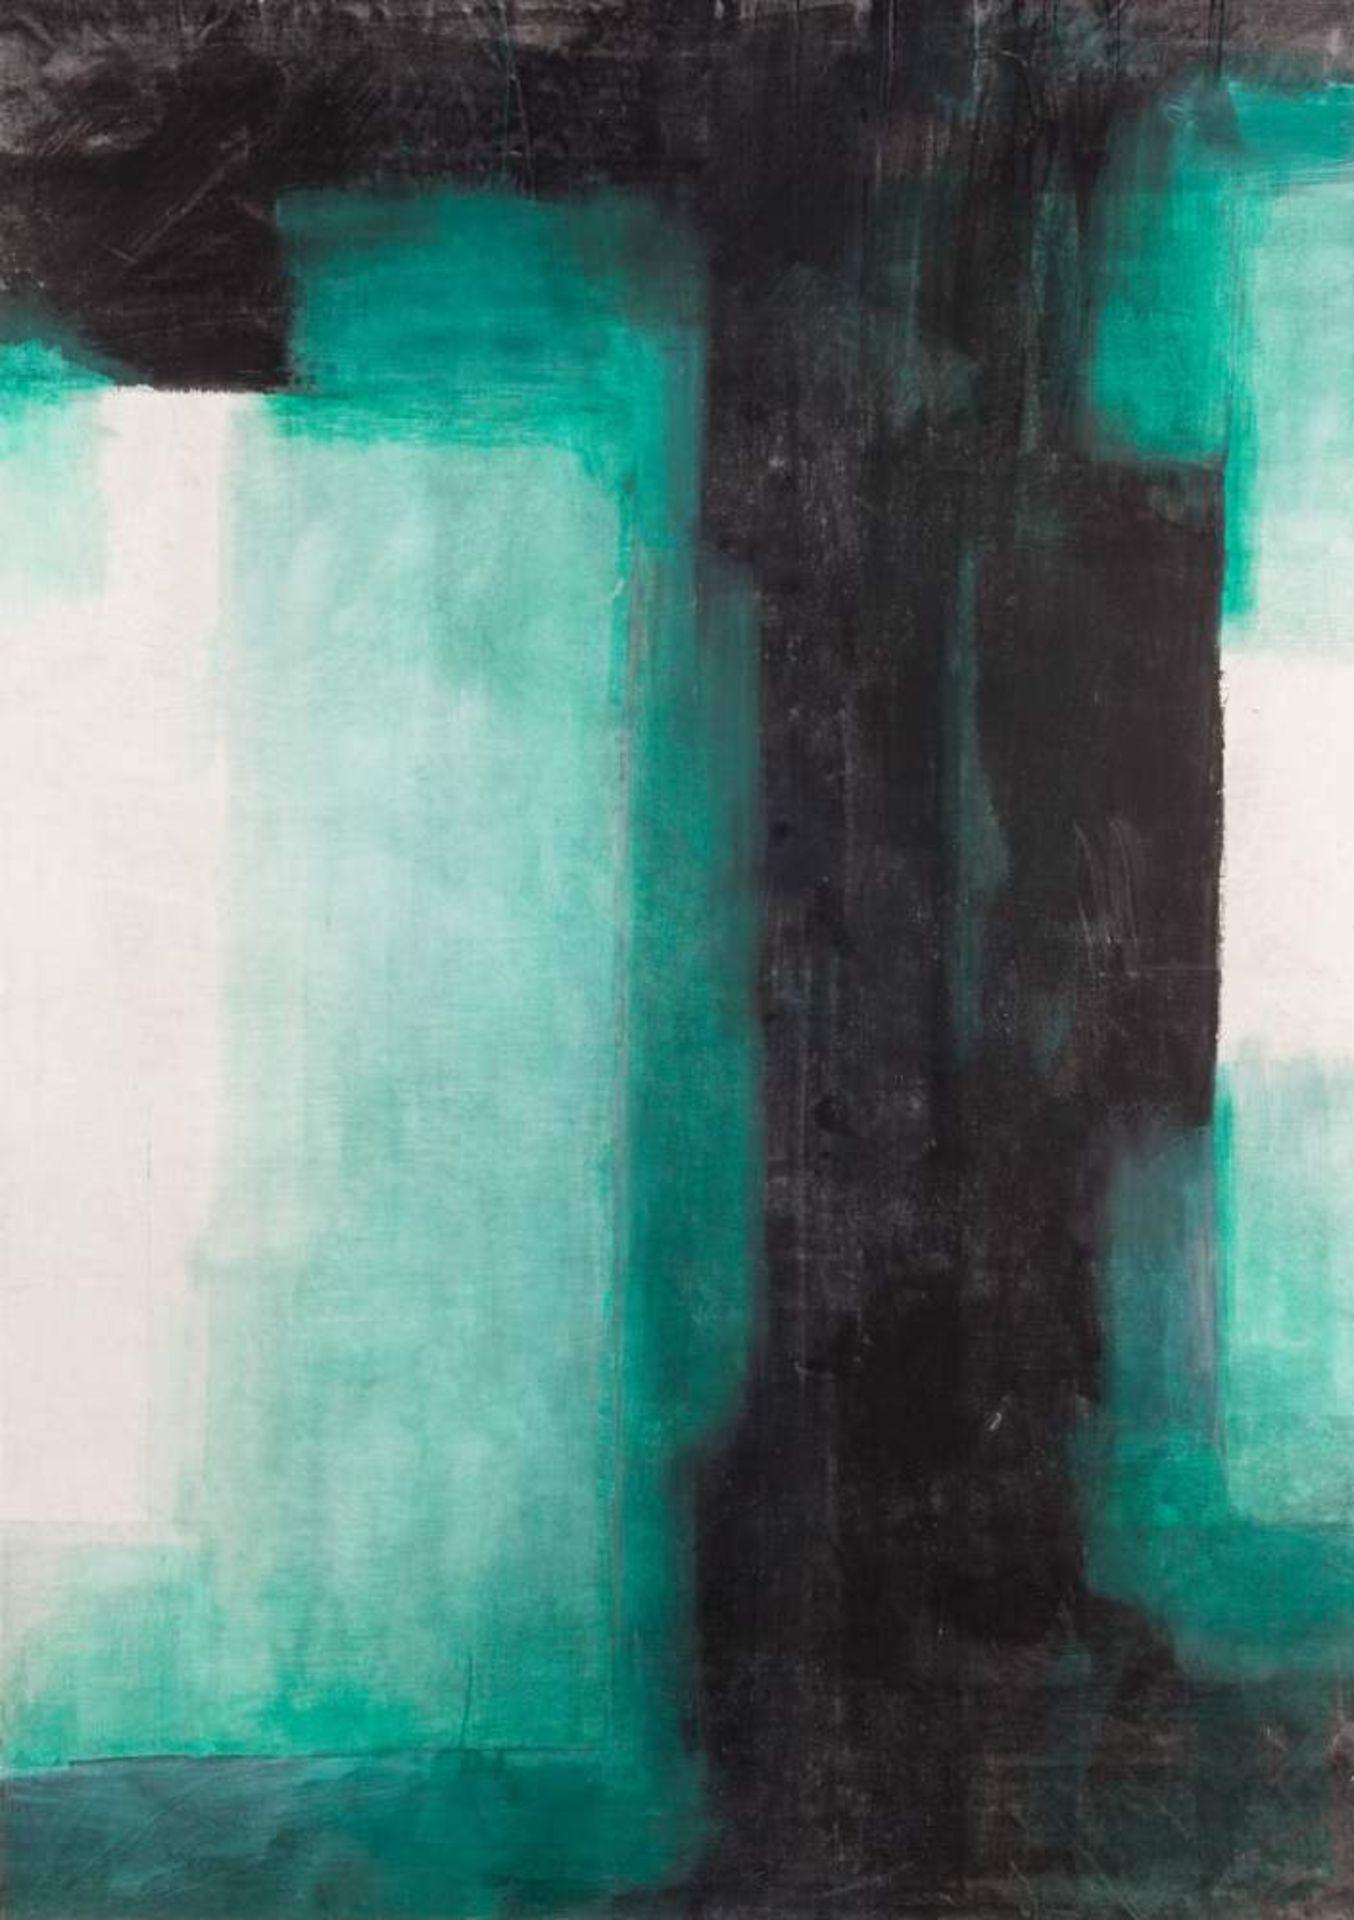 Walter Vopava * (Wien 1948 geb.)  (ohne Titel)  Acryl auf Leinwand 205 x 145 cm 2007 rückseitig zwei